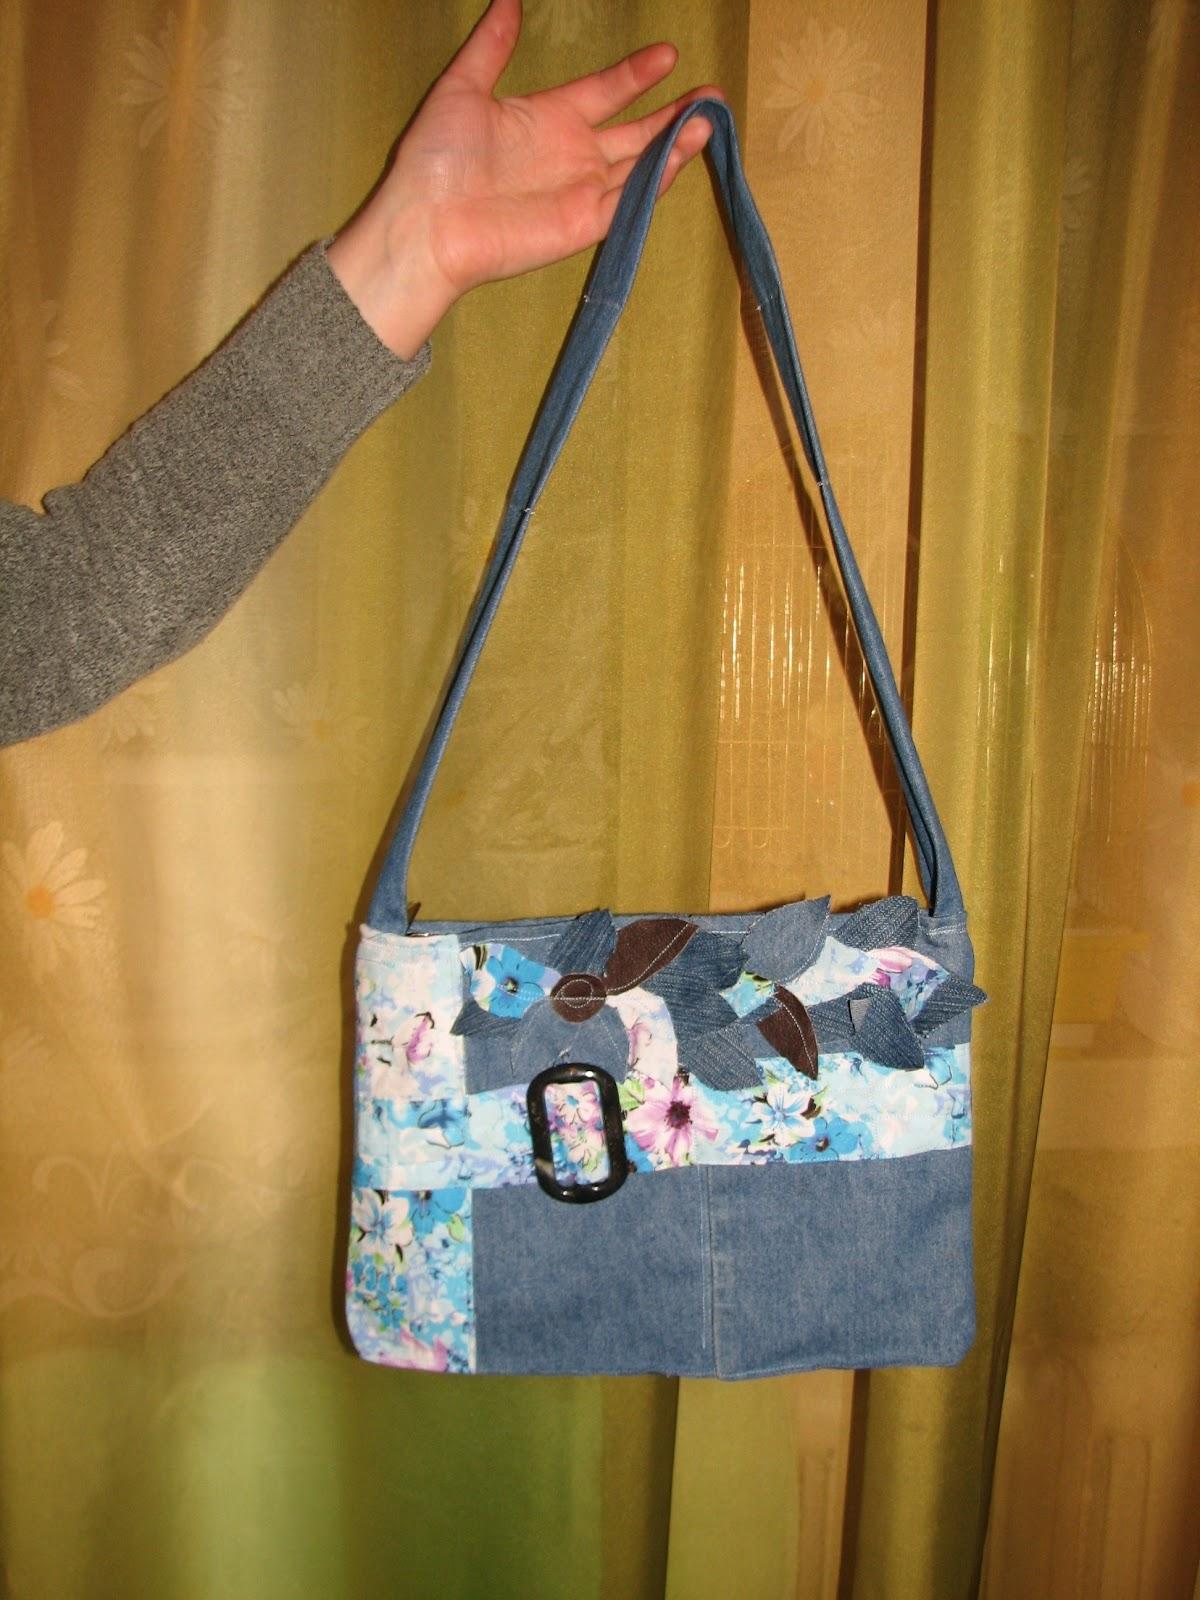 Пошив сумок своими руками фото